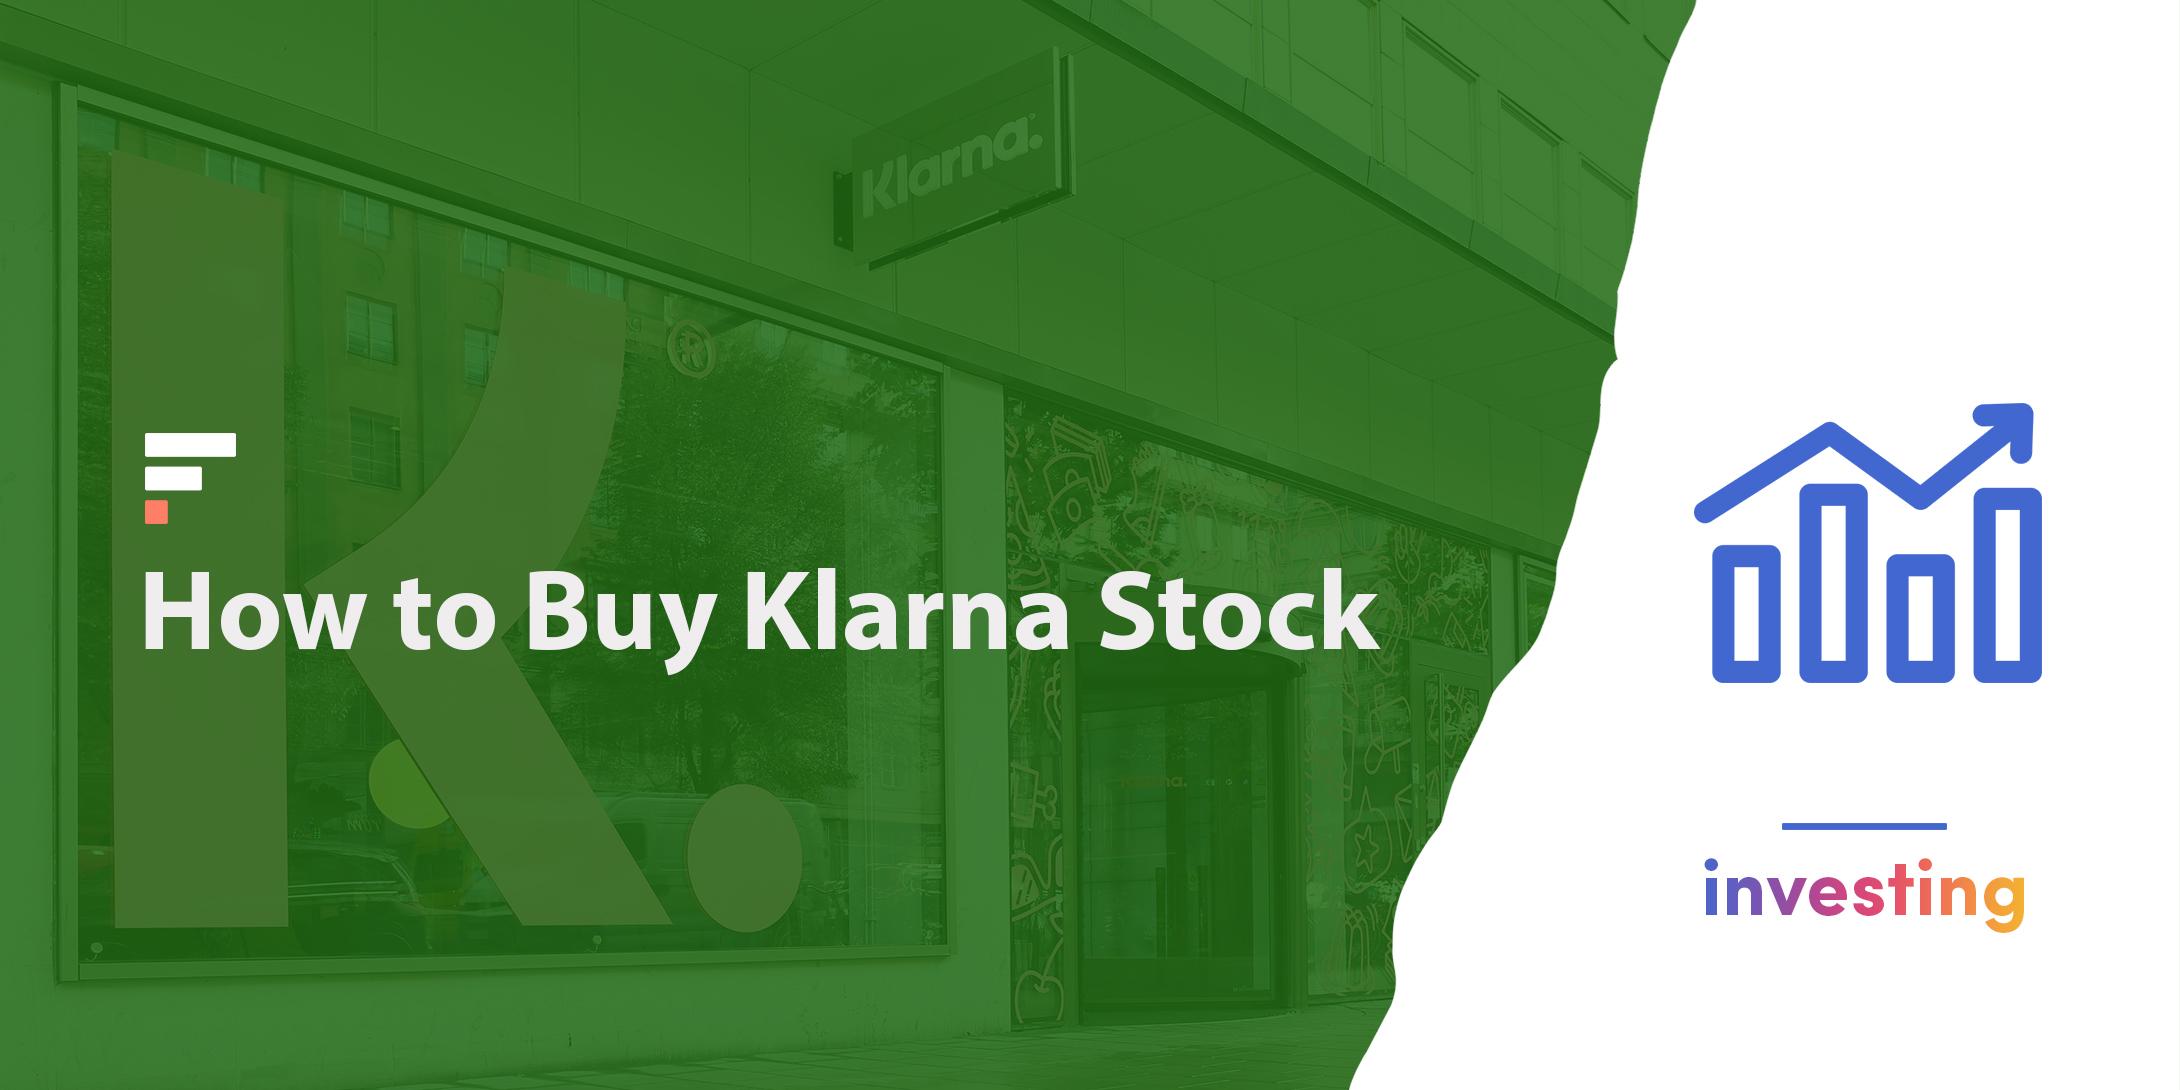 How to buy Klarna stock